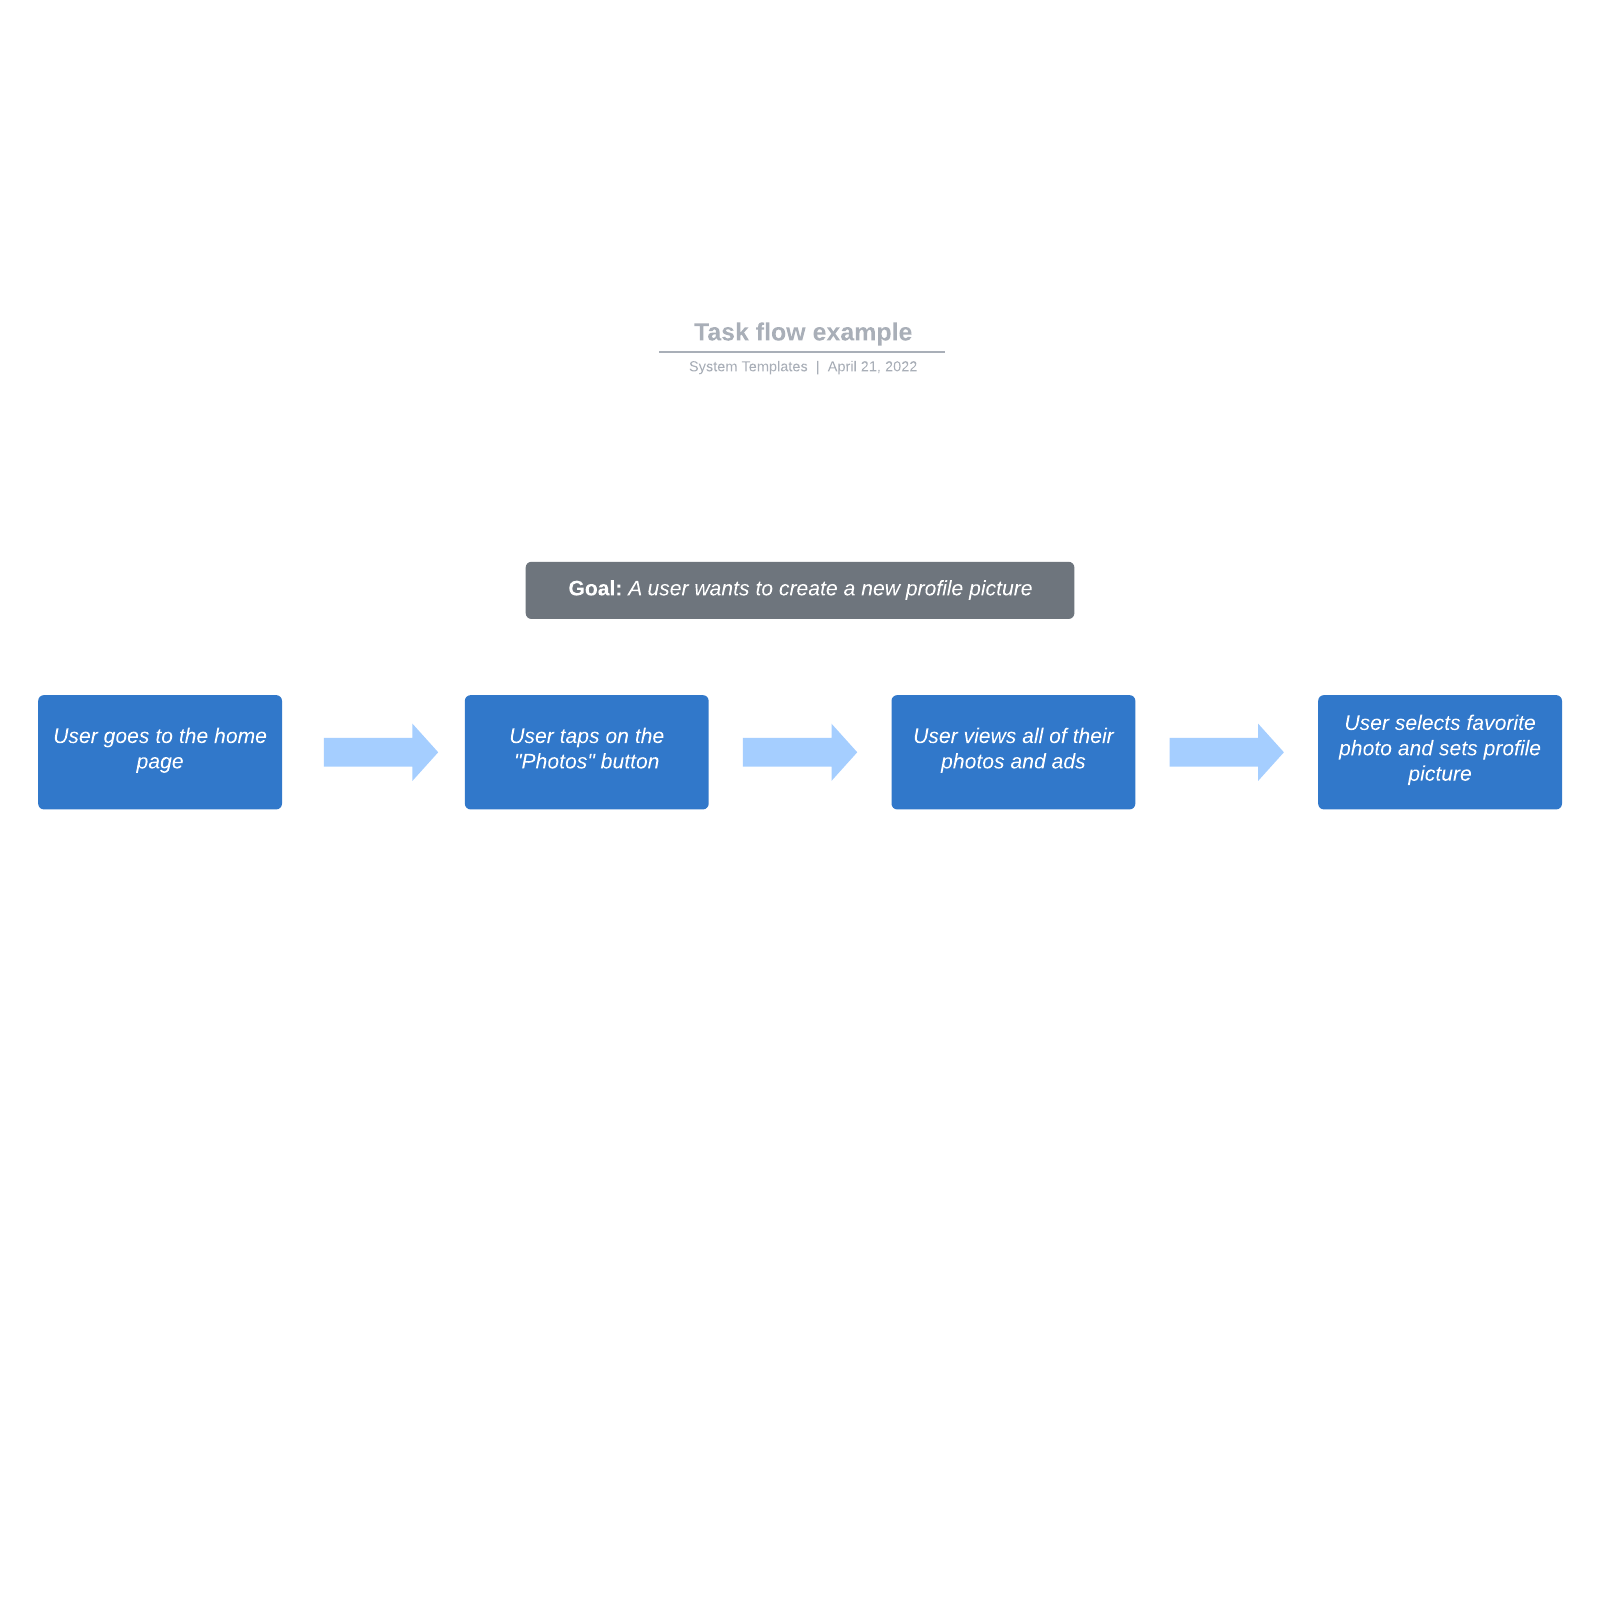 Task flow example